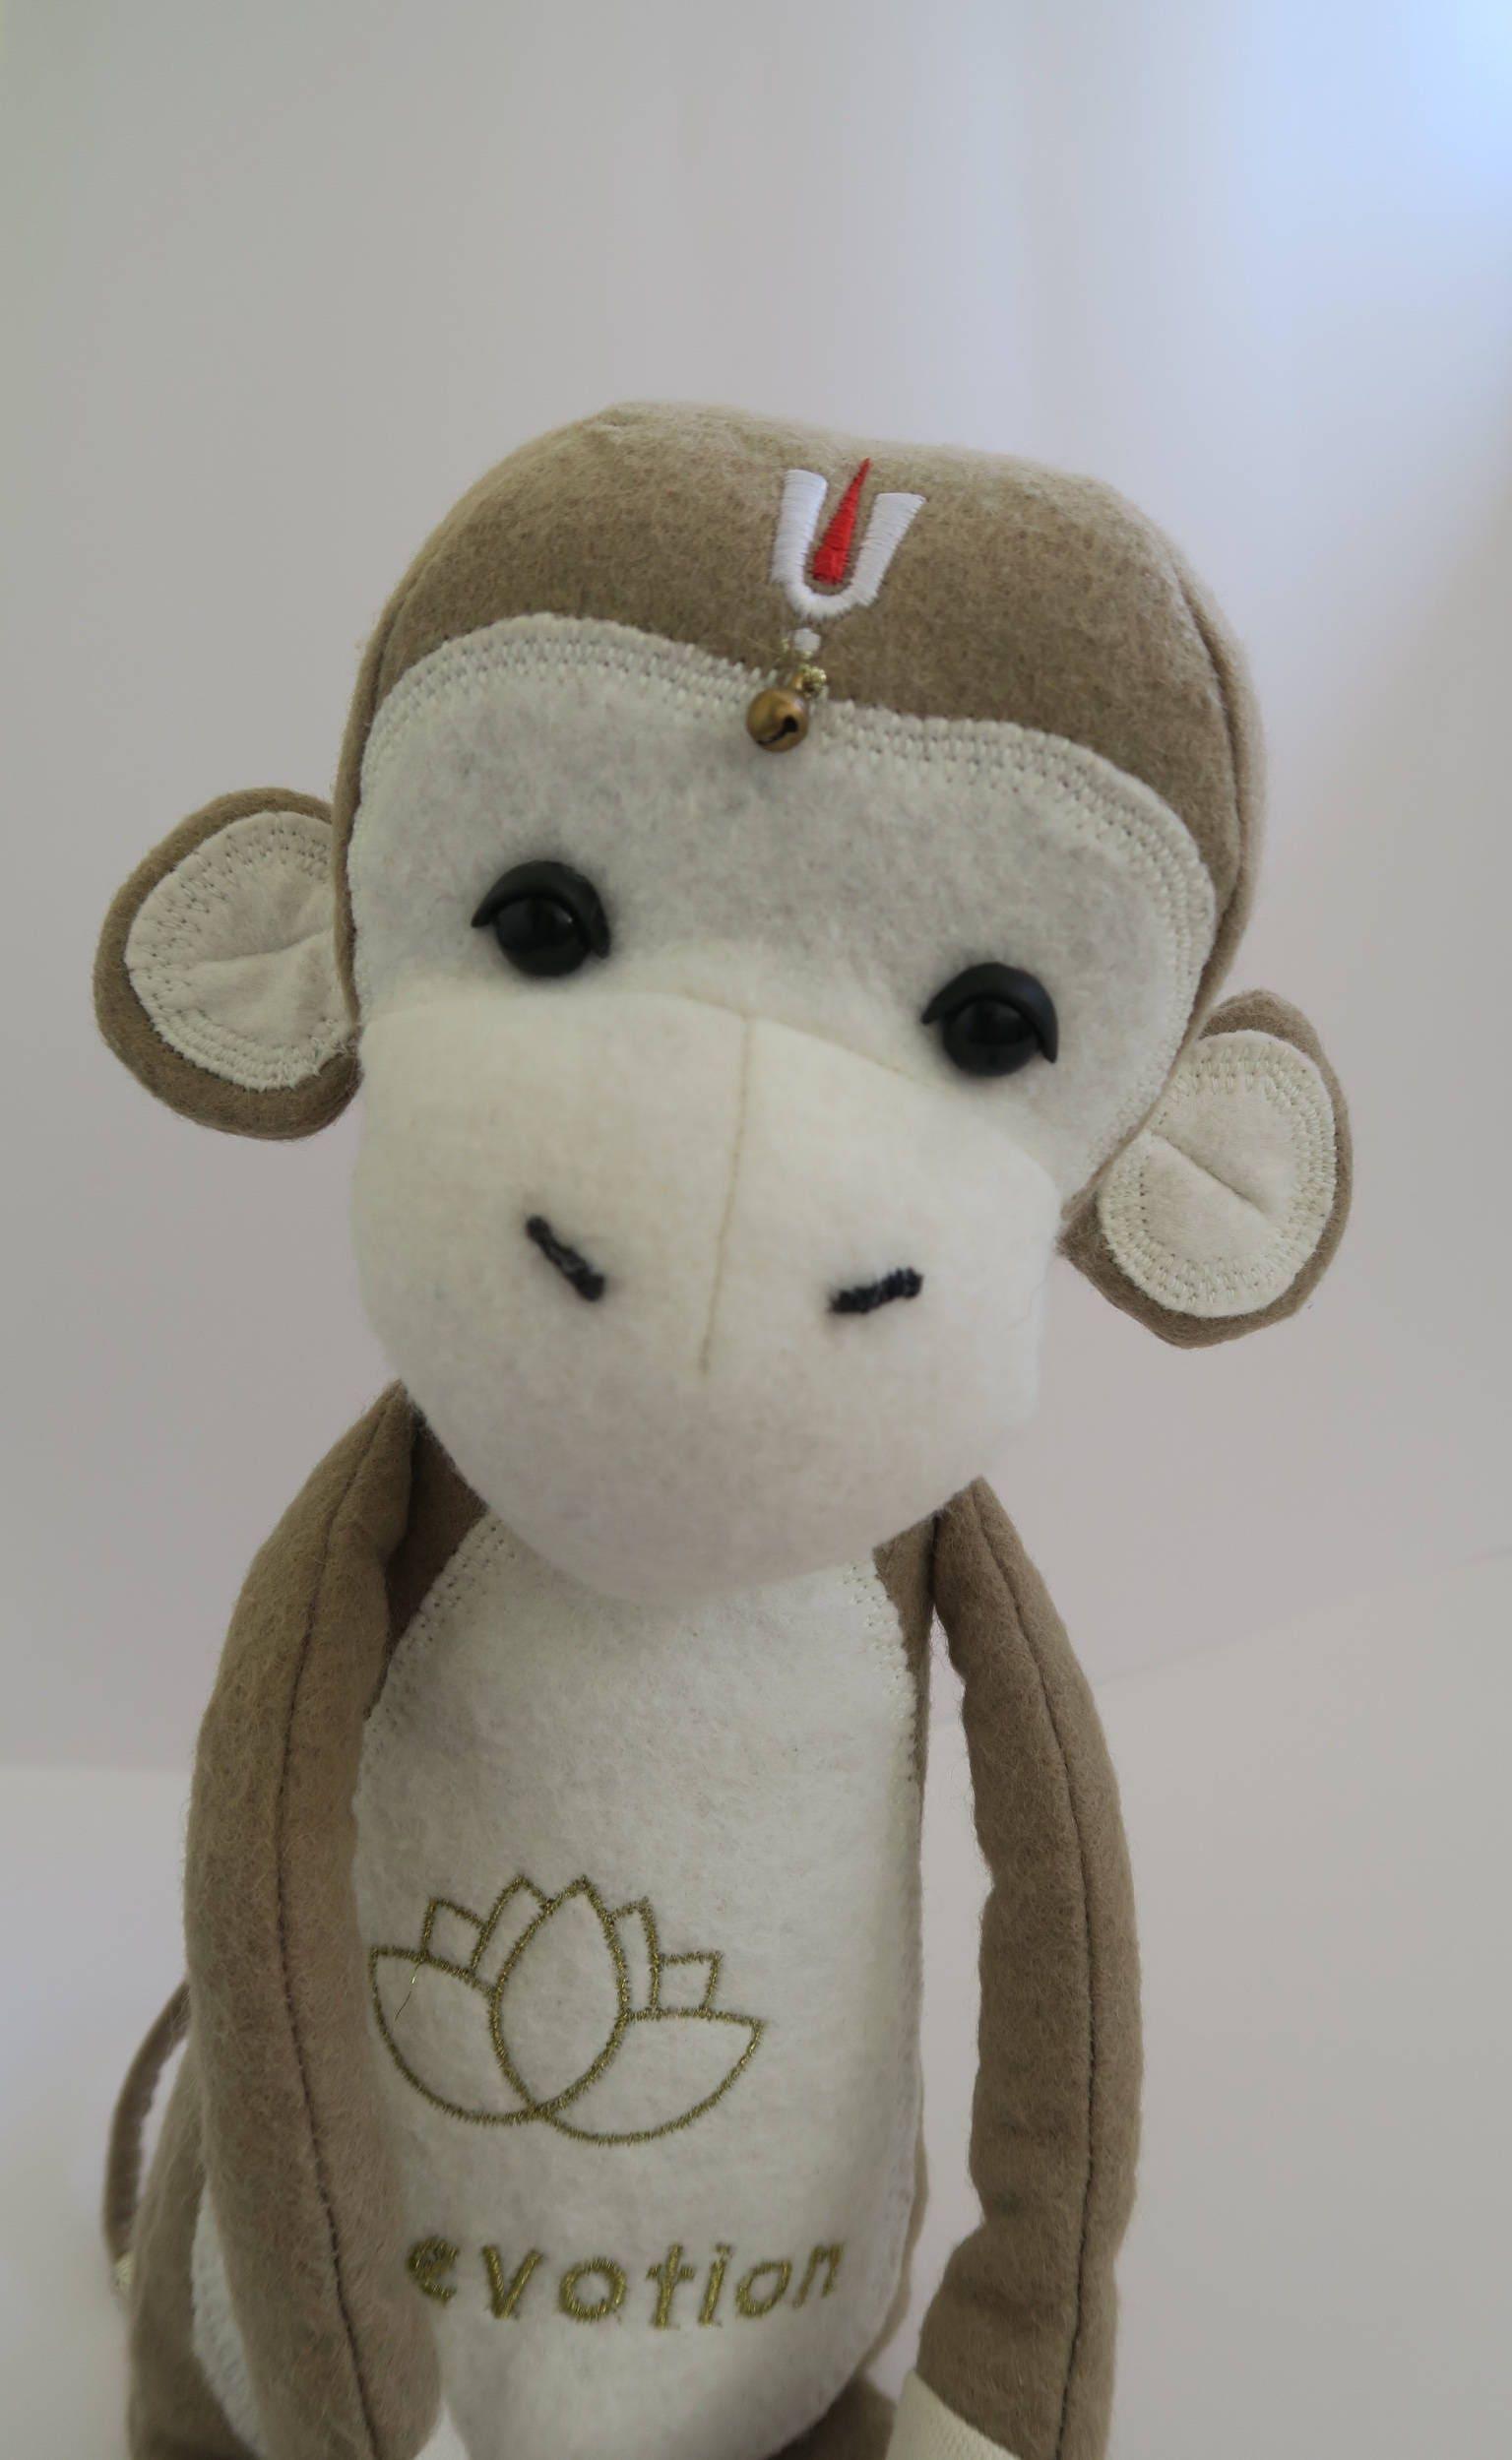 Hanuman deity inspired soft monkey decorative toy